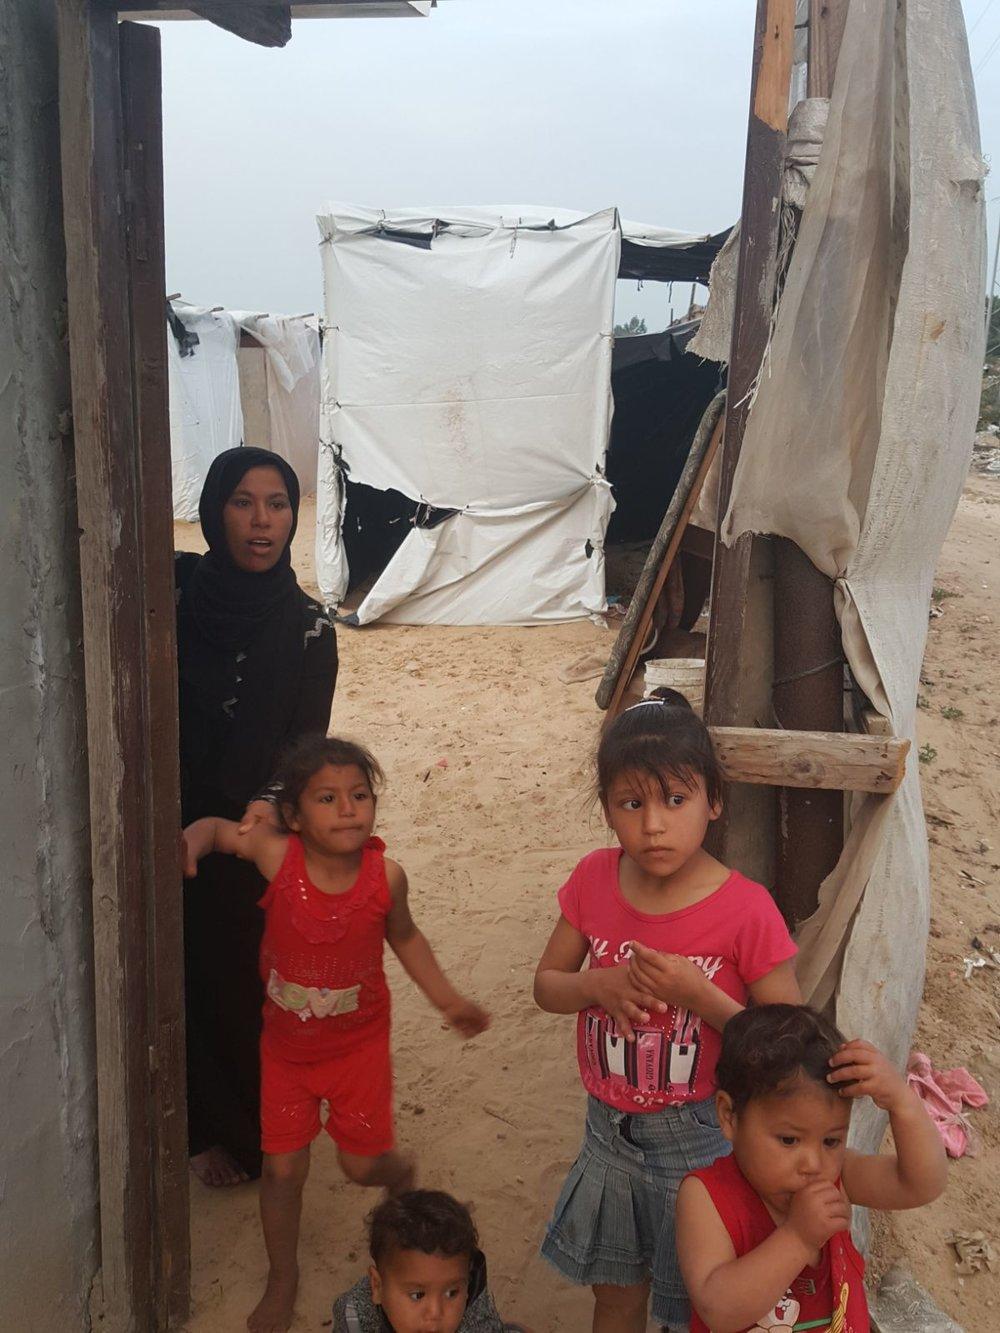 Abeer and her children